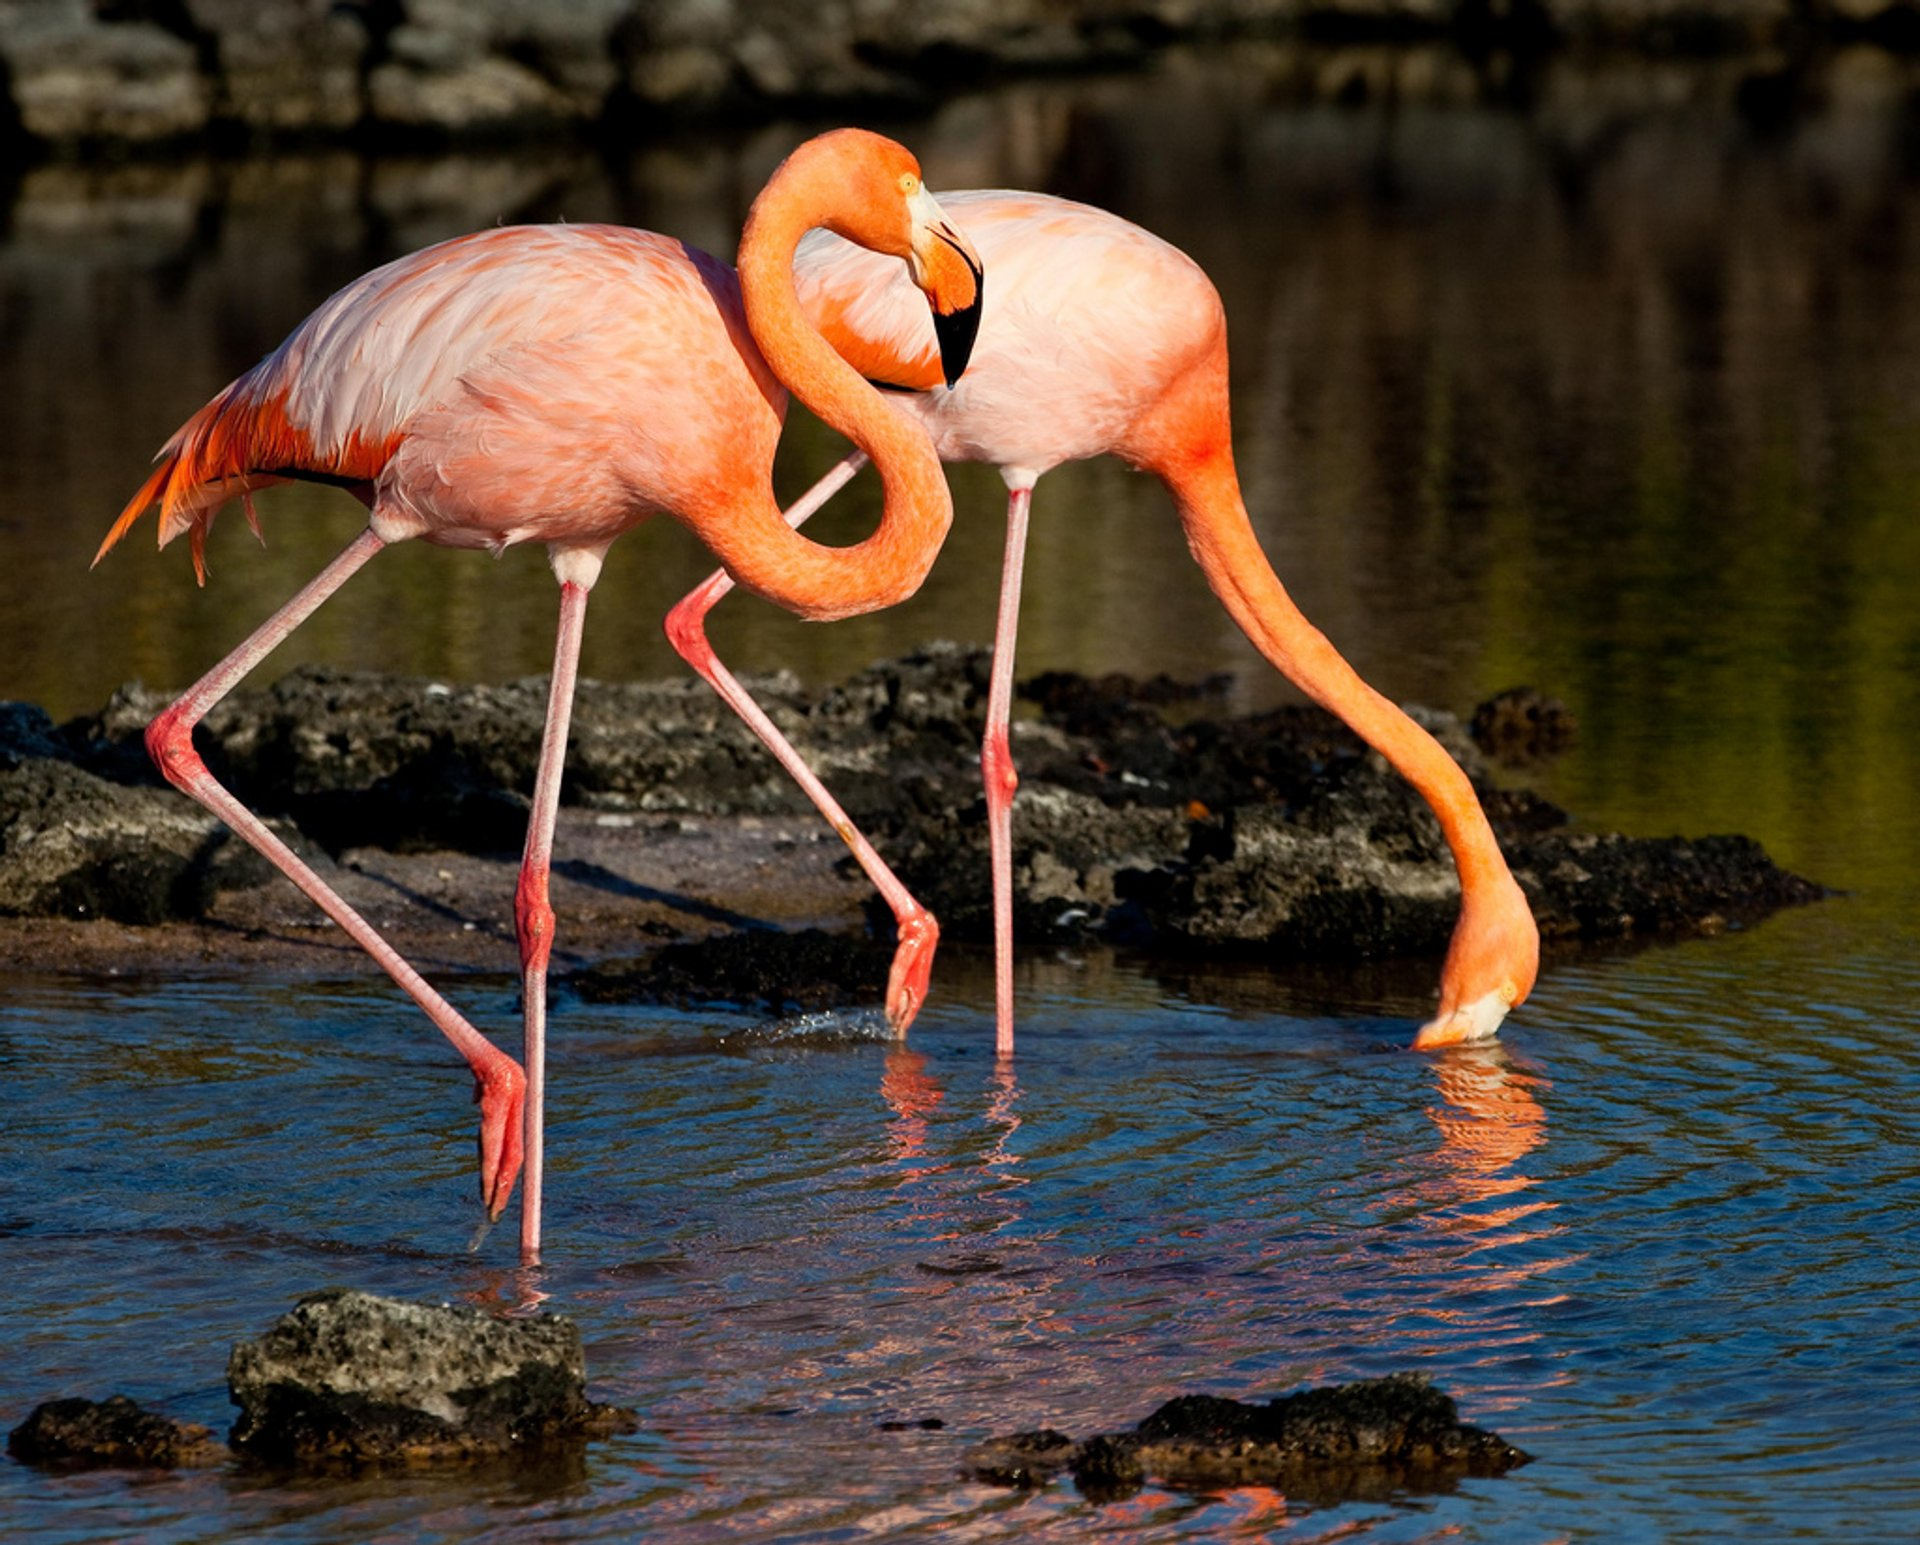 Galapagos Flamingos Courtship Dances in Galapagos Islands - Best Season 2020